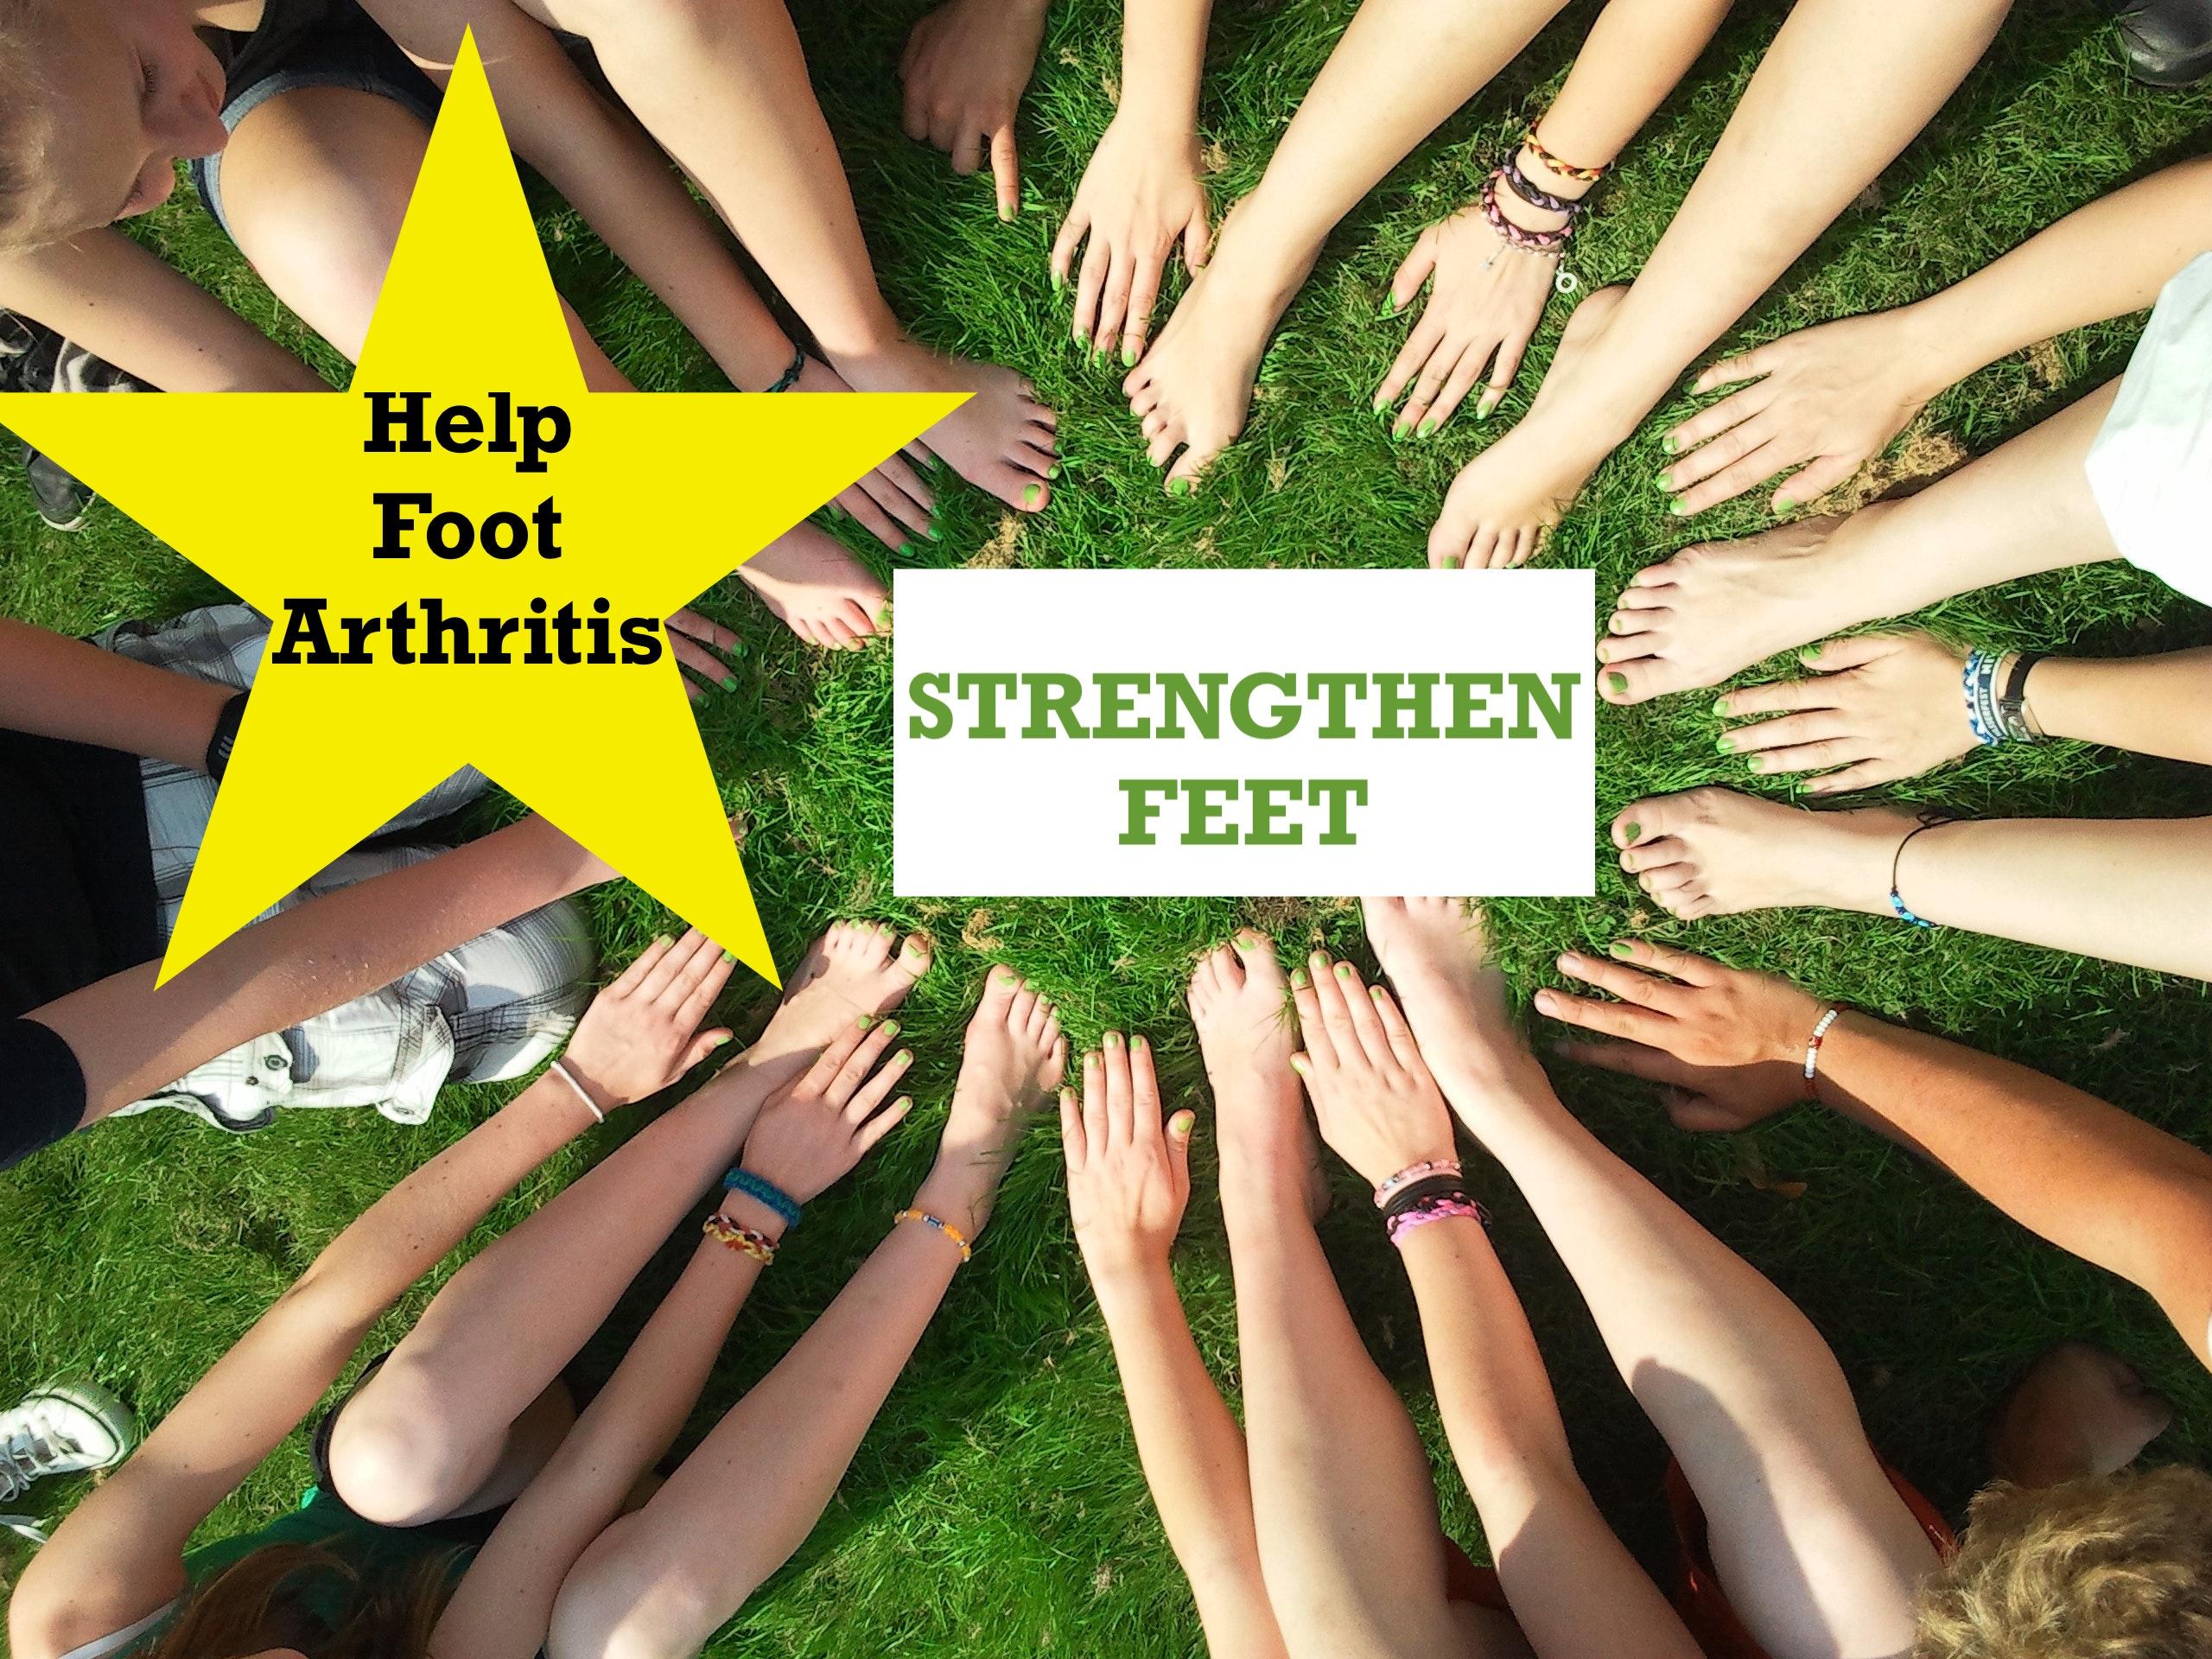 Helping Arthritic Feet-Strengthening the Feet